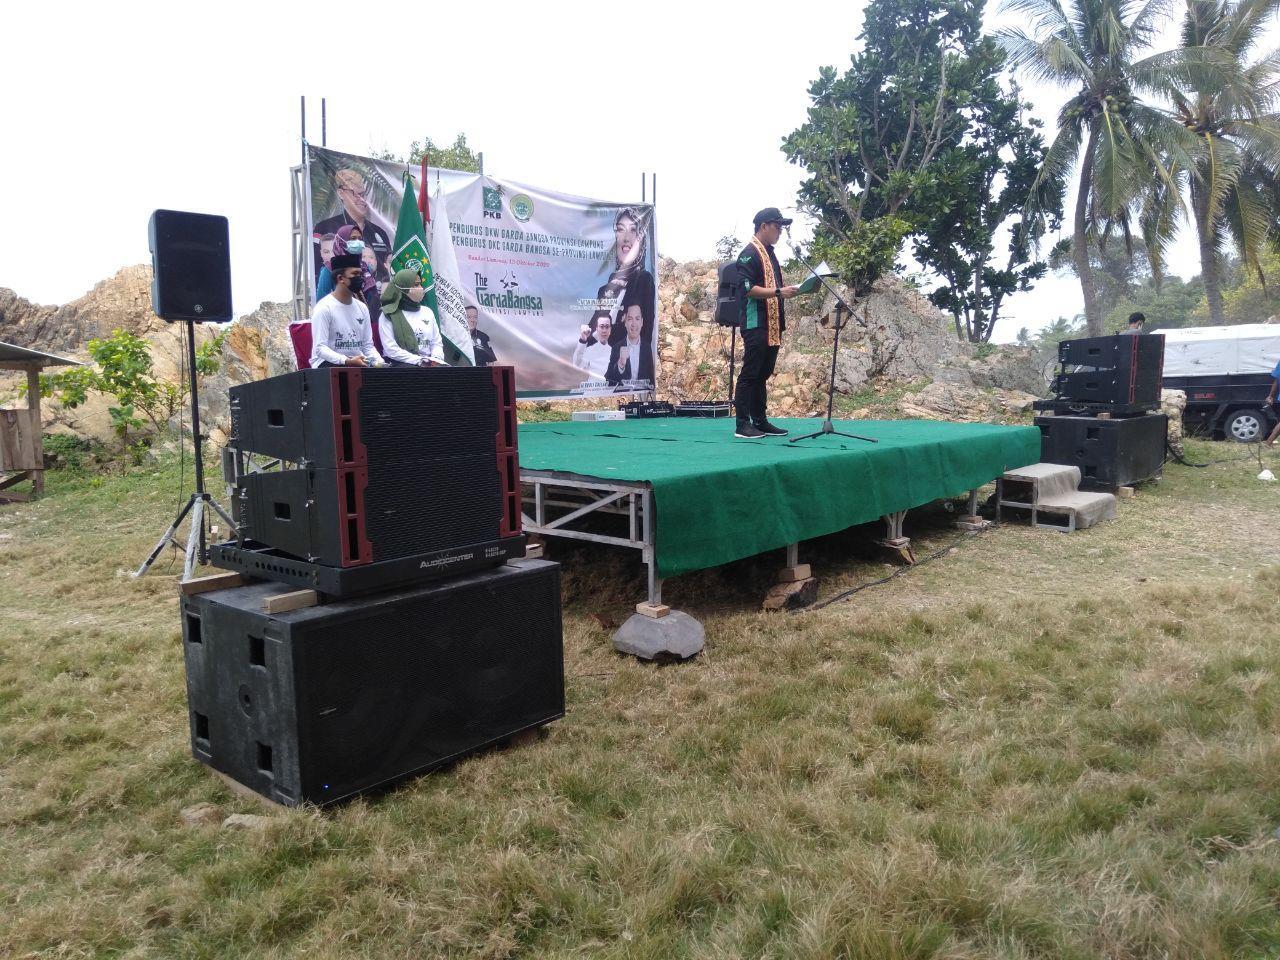 Pelantikan DKW Garda Bangsa Provinsi Lampung Pantai Marina 2020